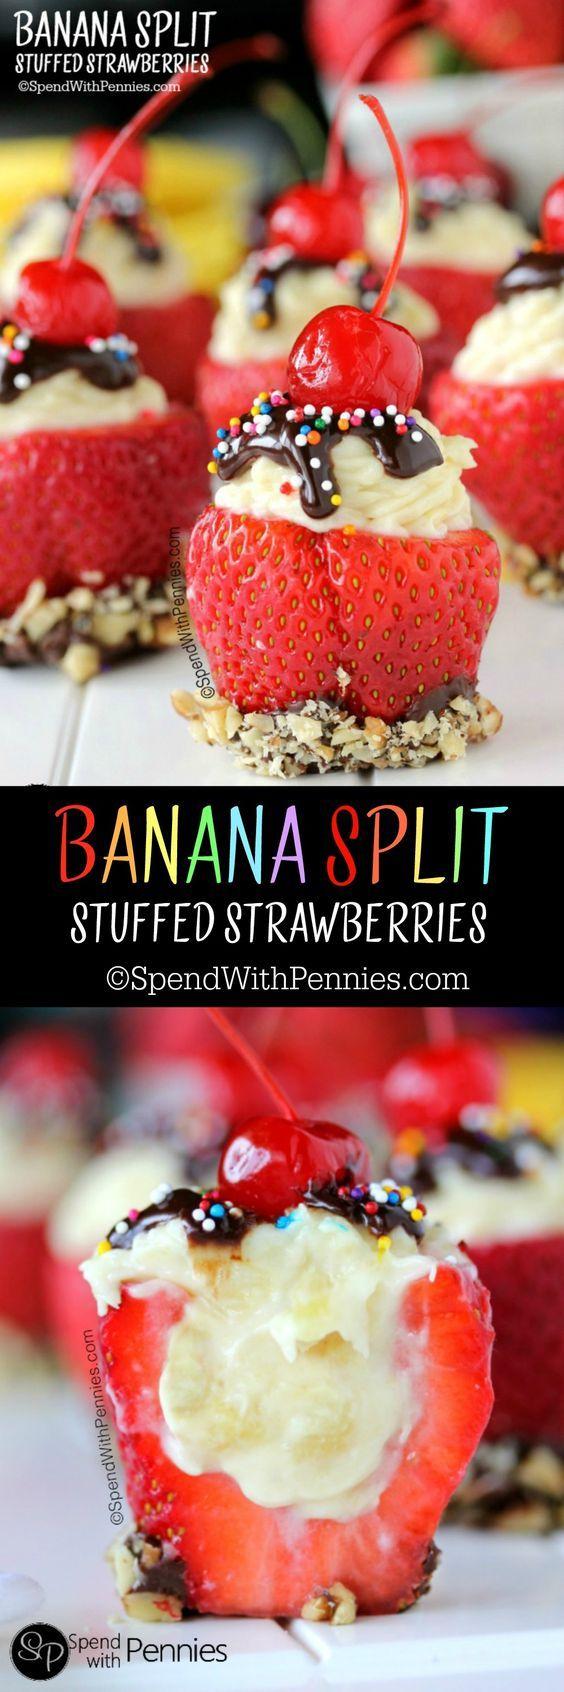 Banana Split Strawberries